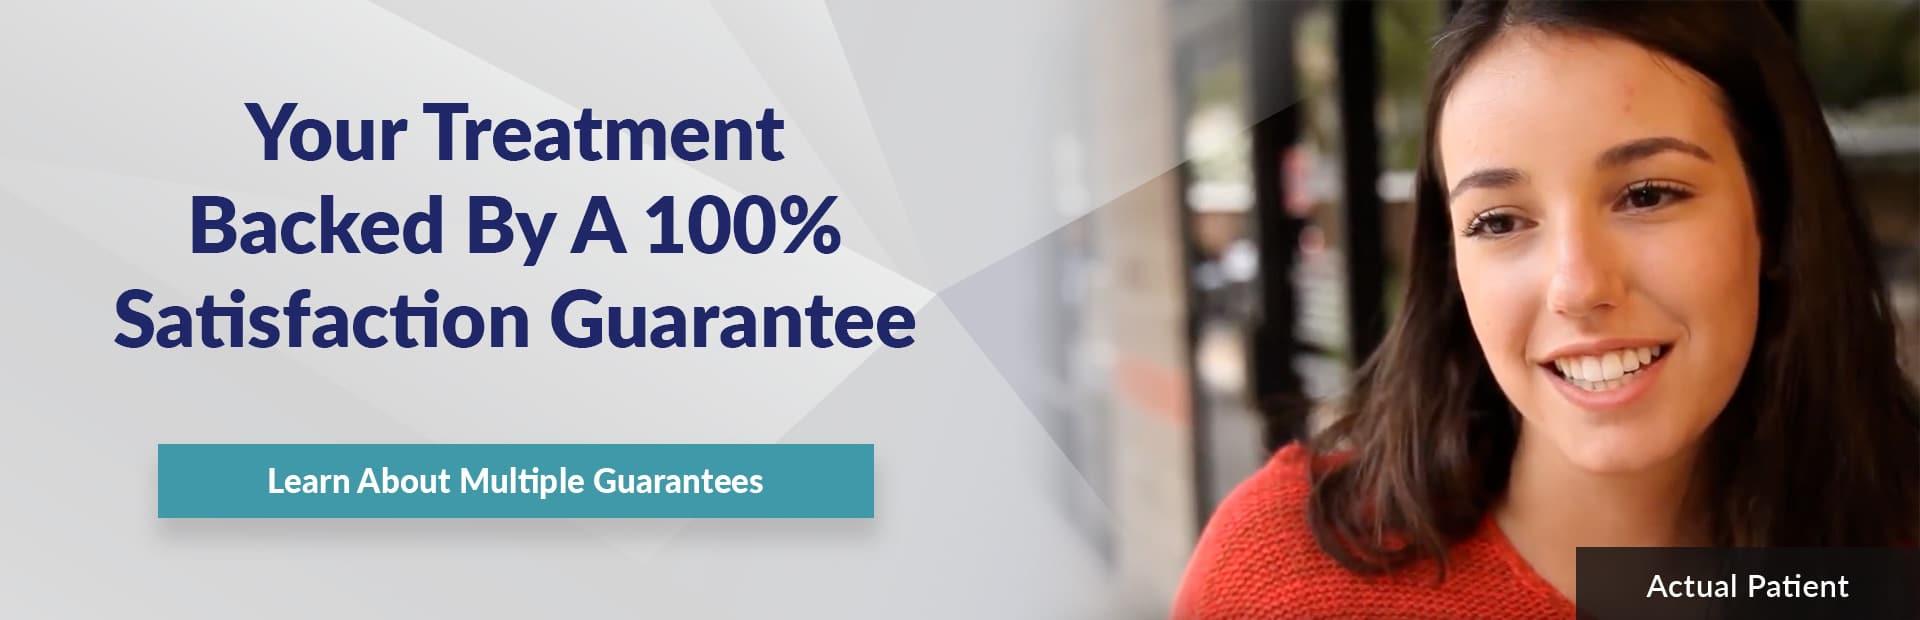 learn more multiple guarantees